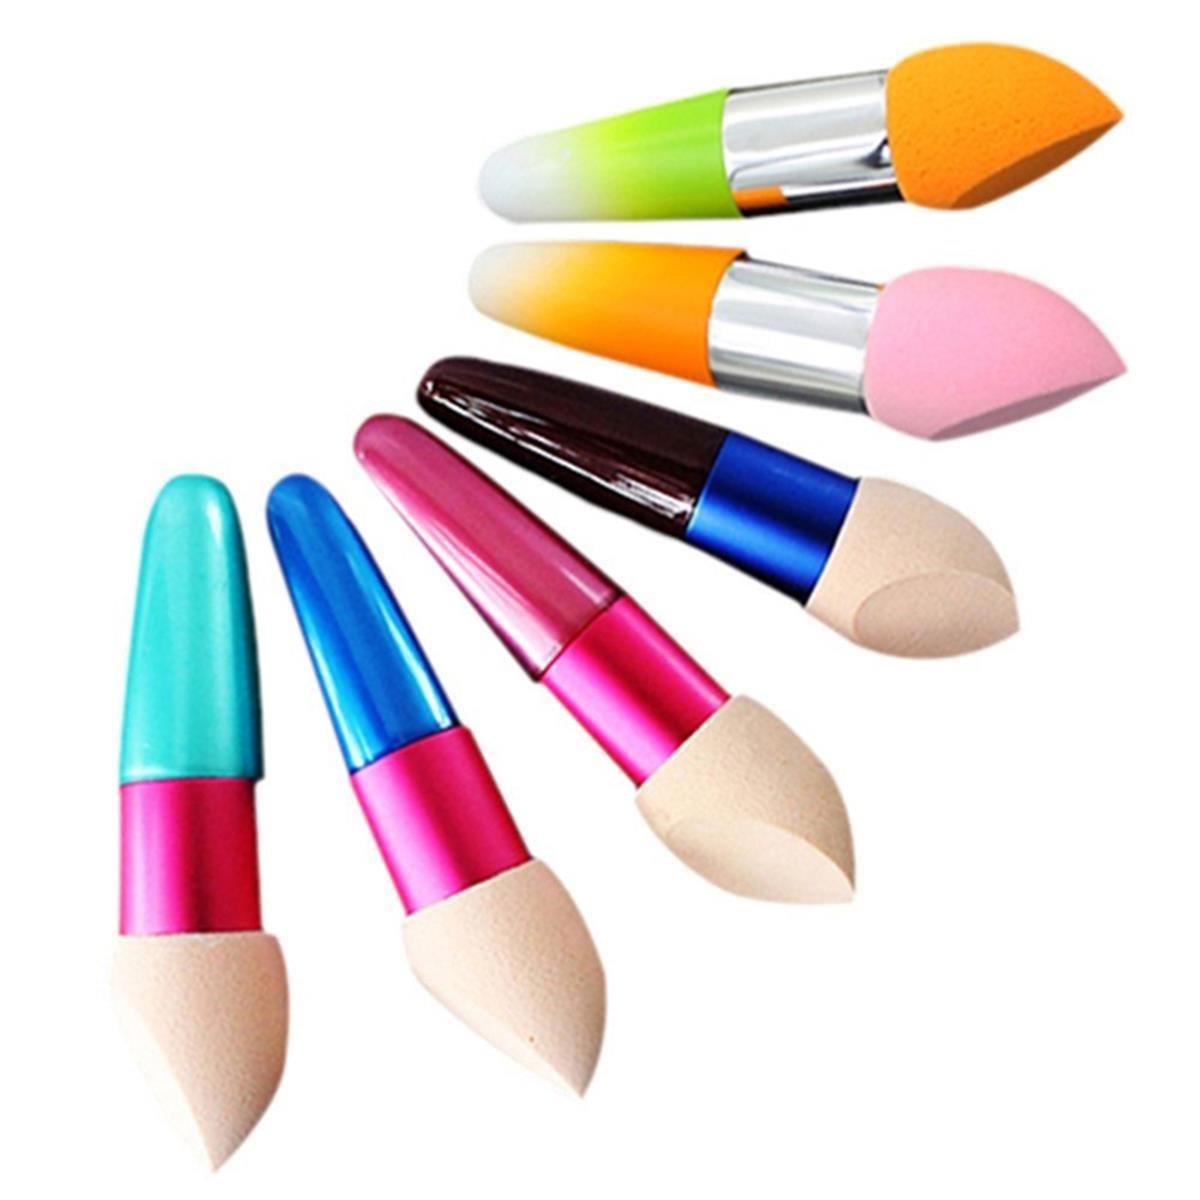 LONGQI 2Pcs/Set Powder Puff Pen Liquid Cream Foundation Concealer Bevelled Shape Sponge Brush